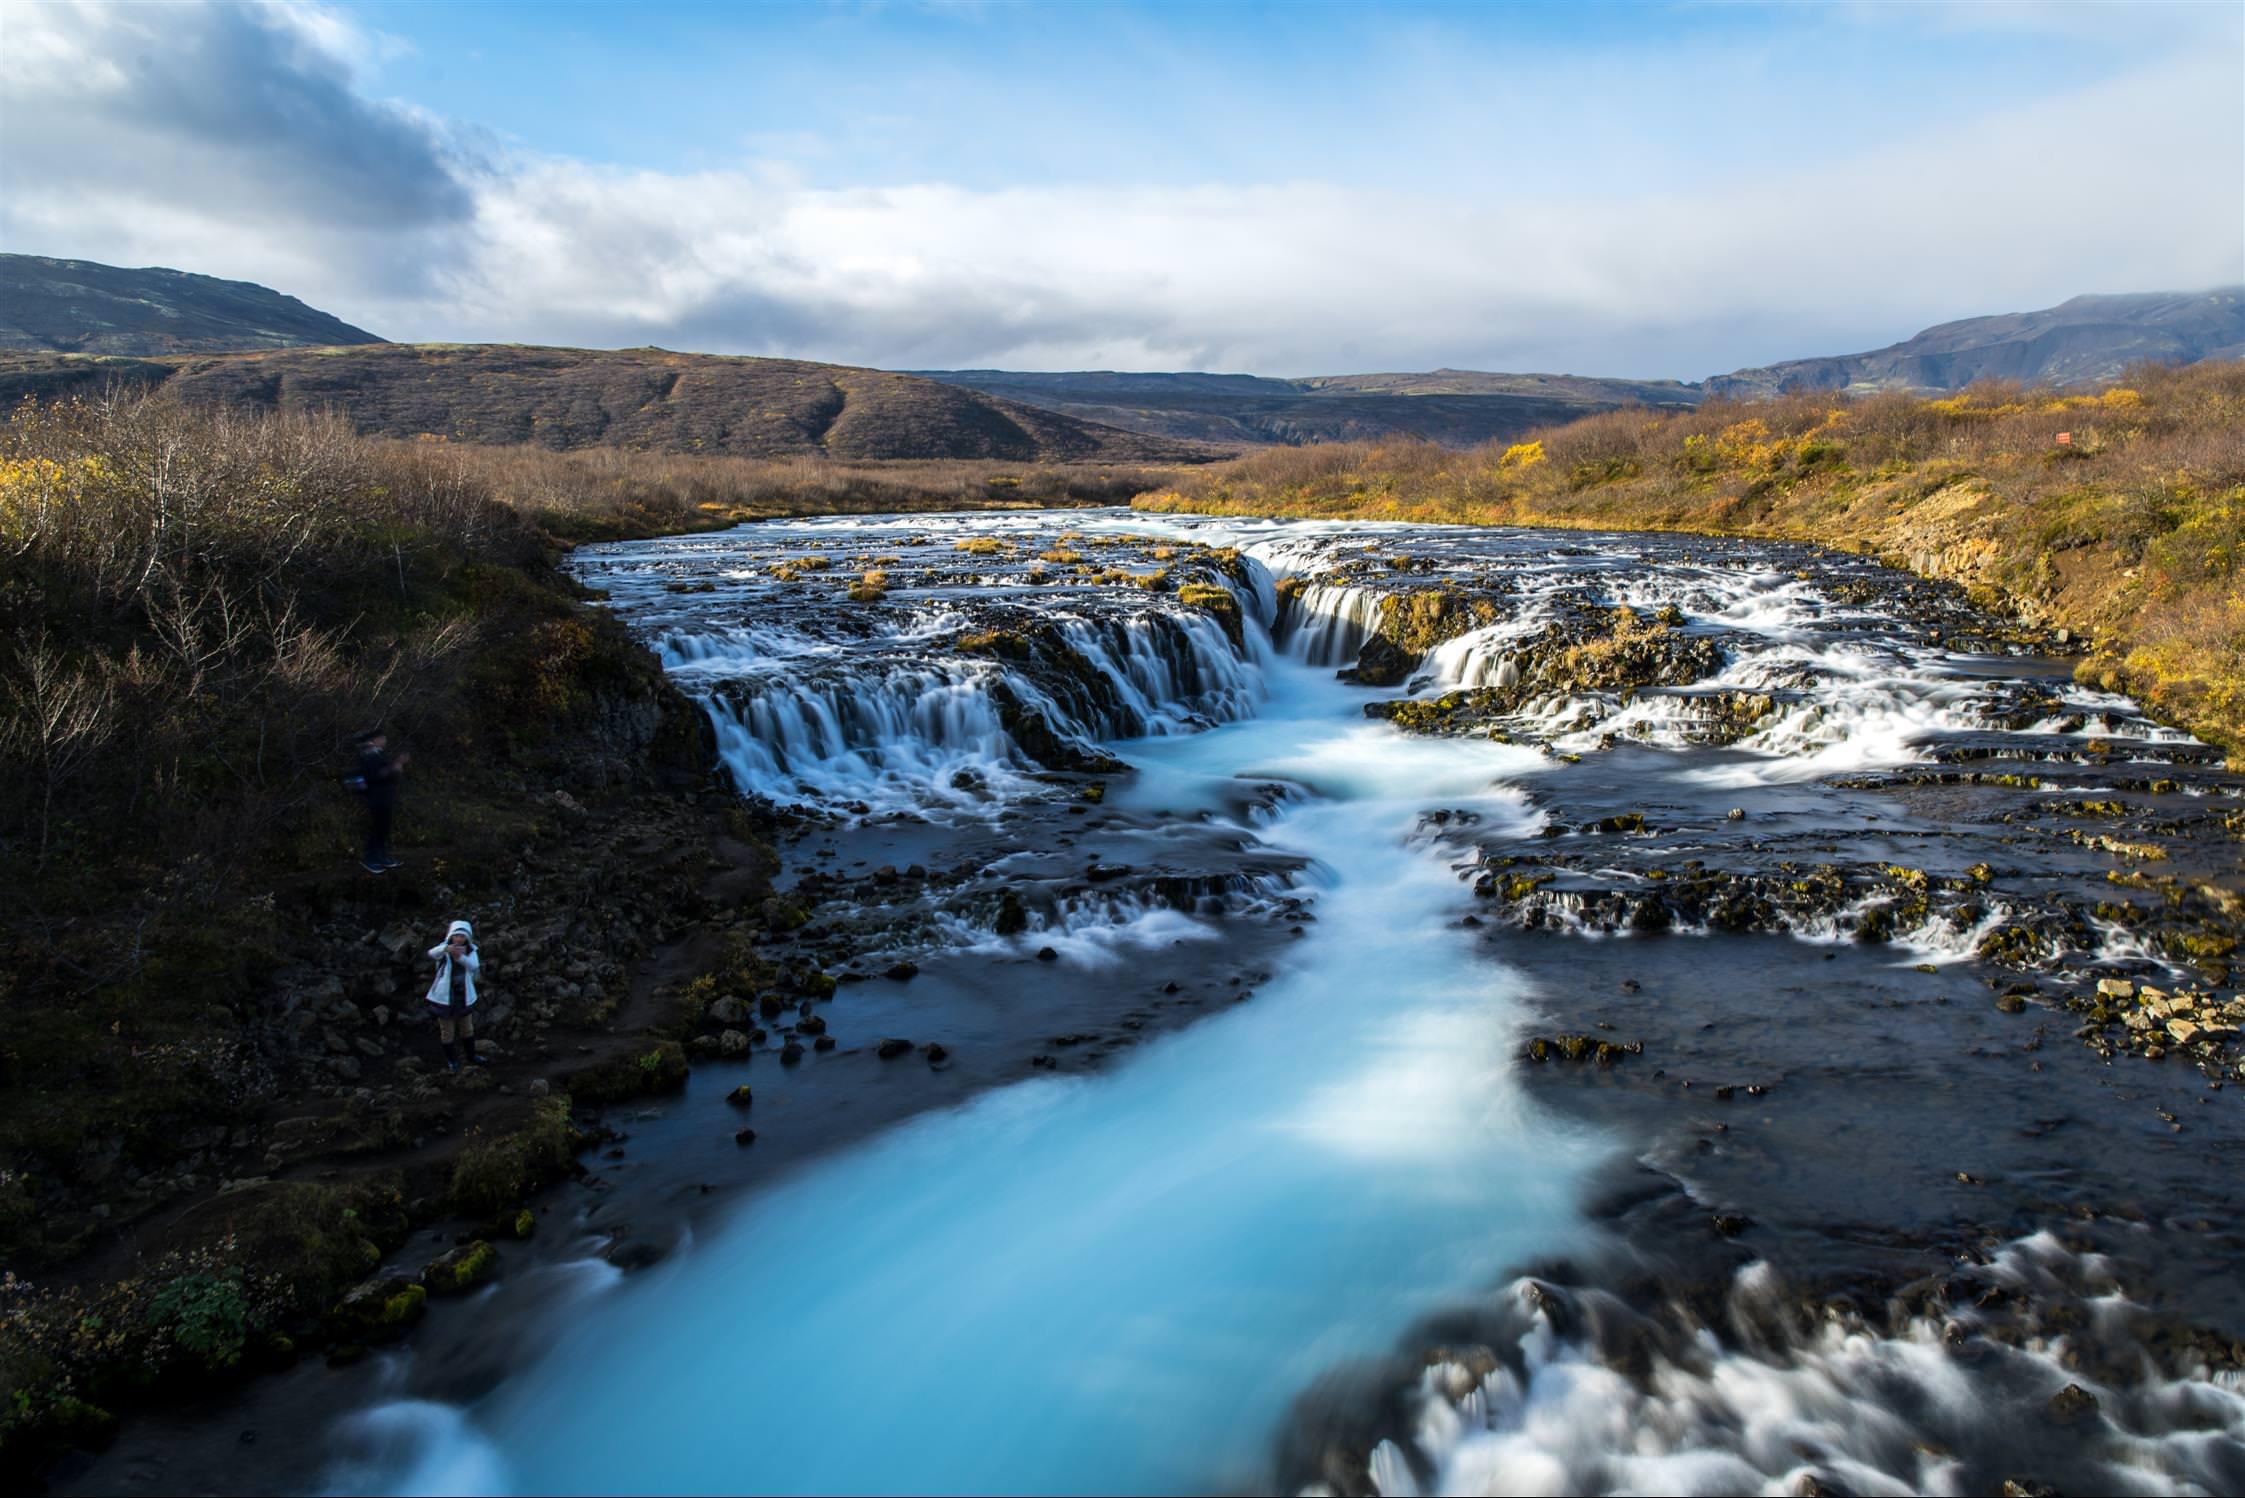 Bruarfoss Waterfall 藍色秘境瀑布